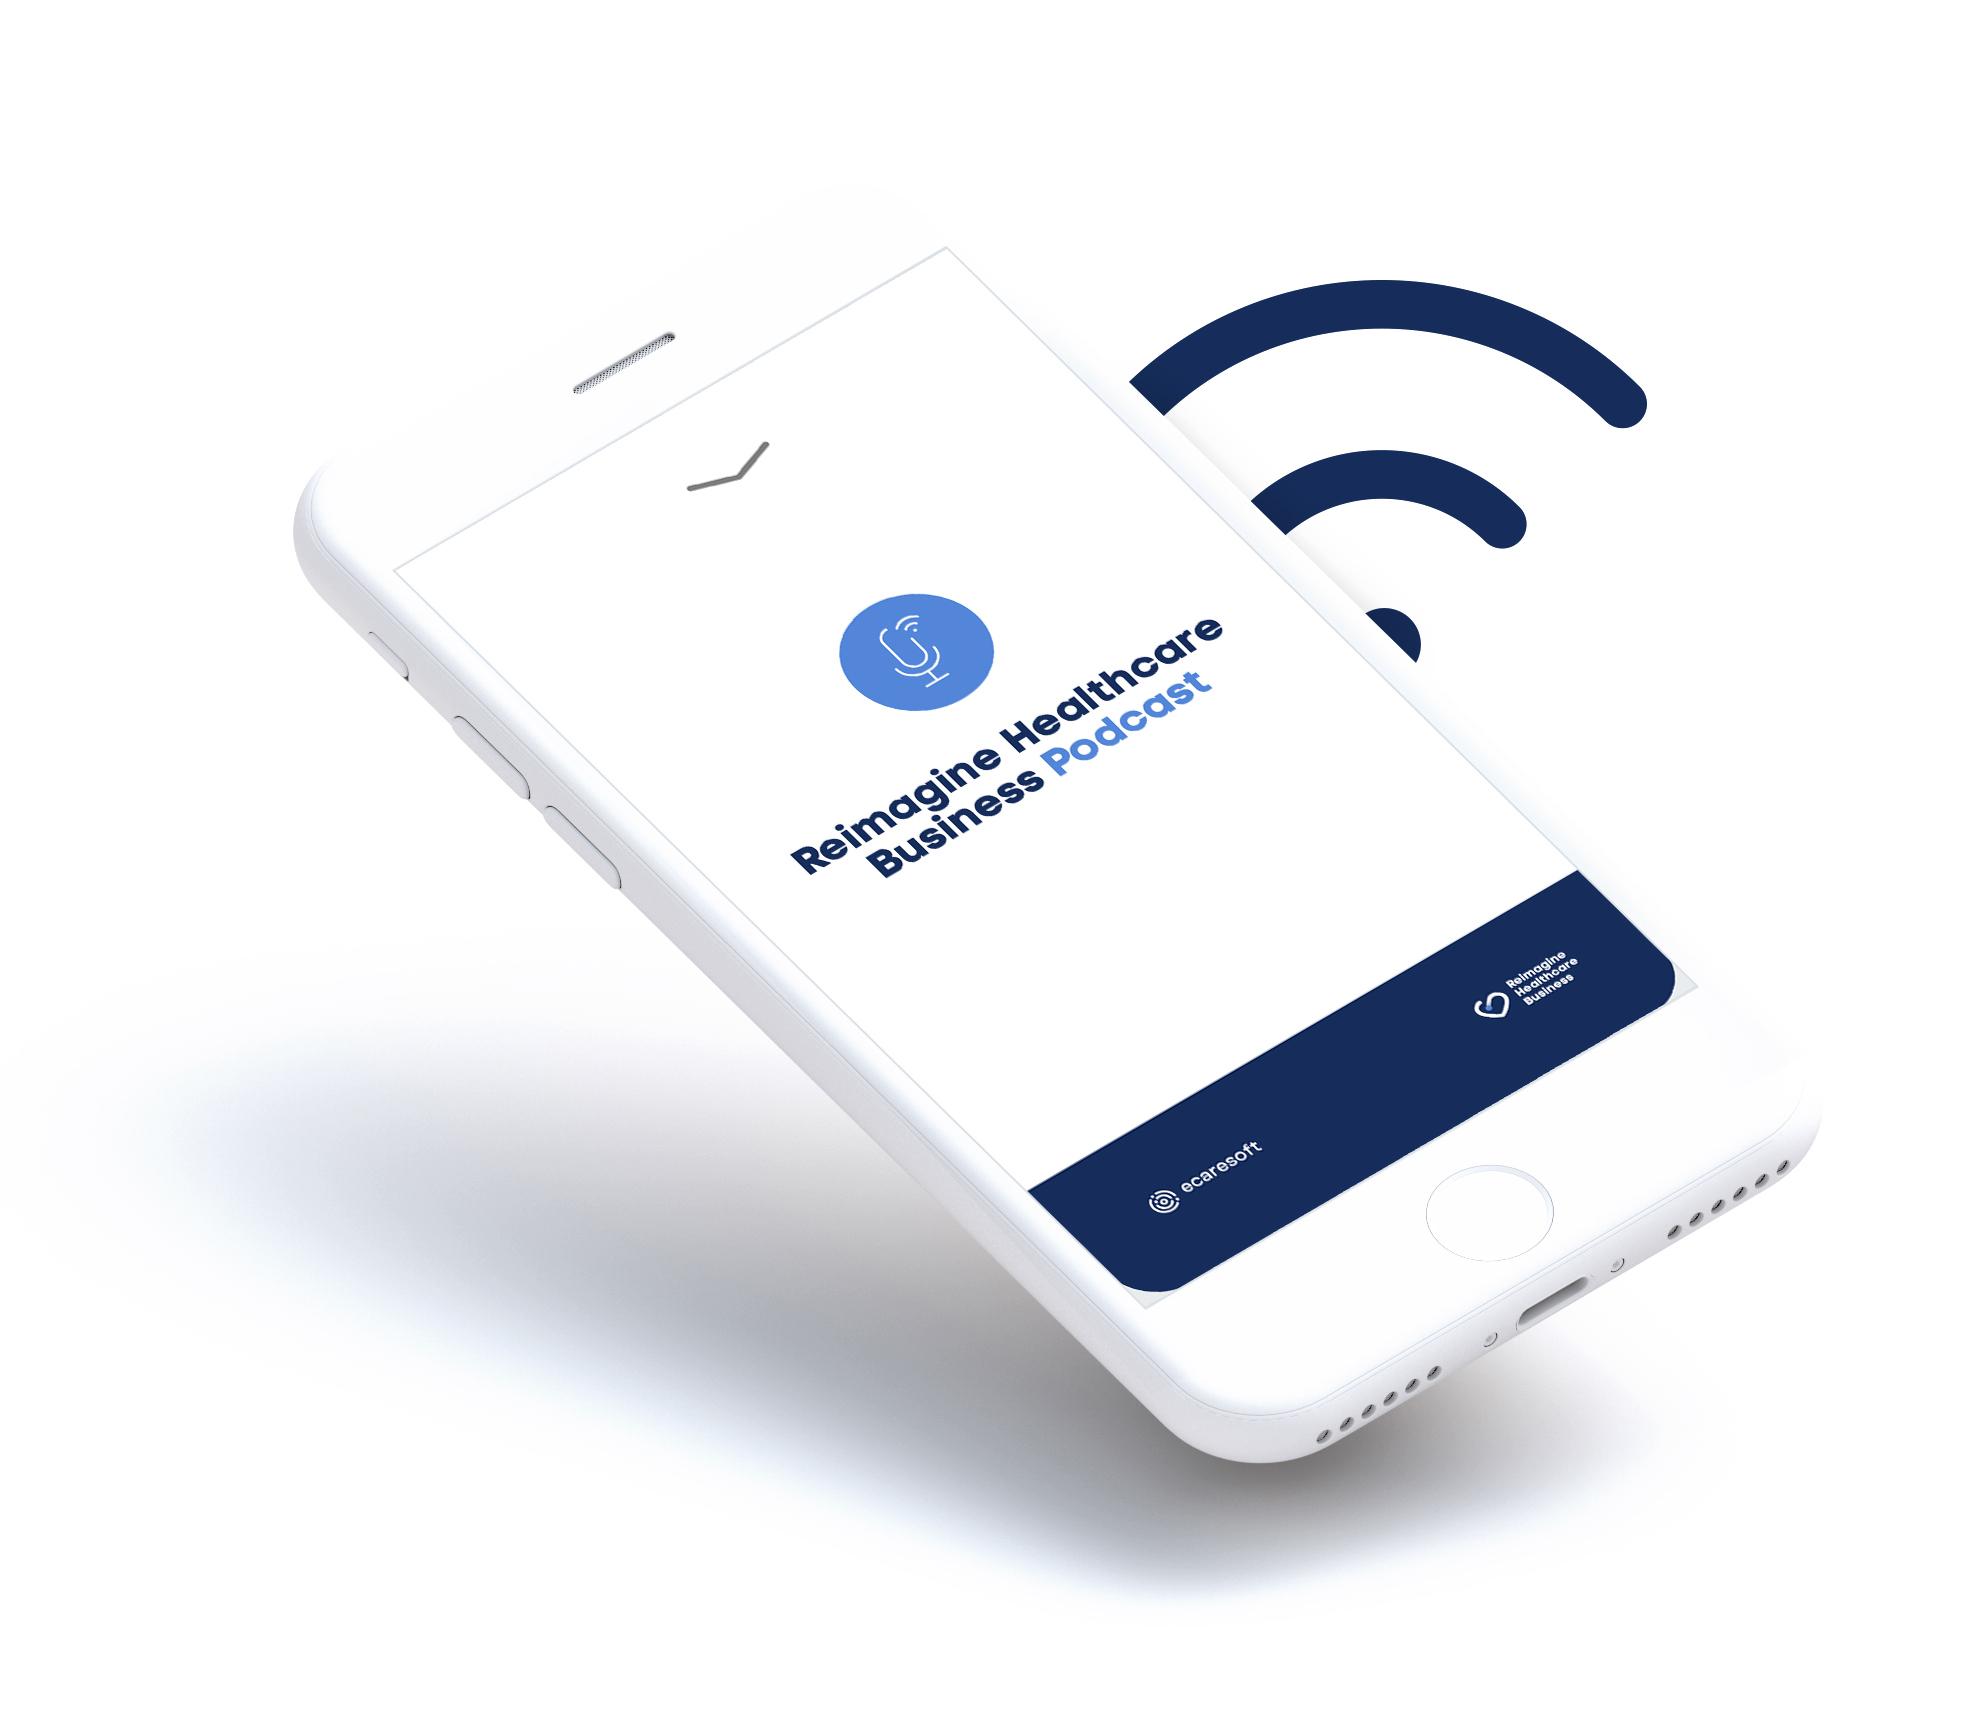 iPhone reproduciendo lel podcast Reimagine Healthcare Business